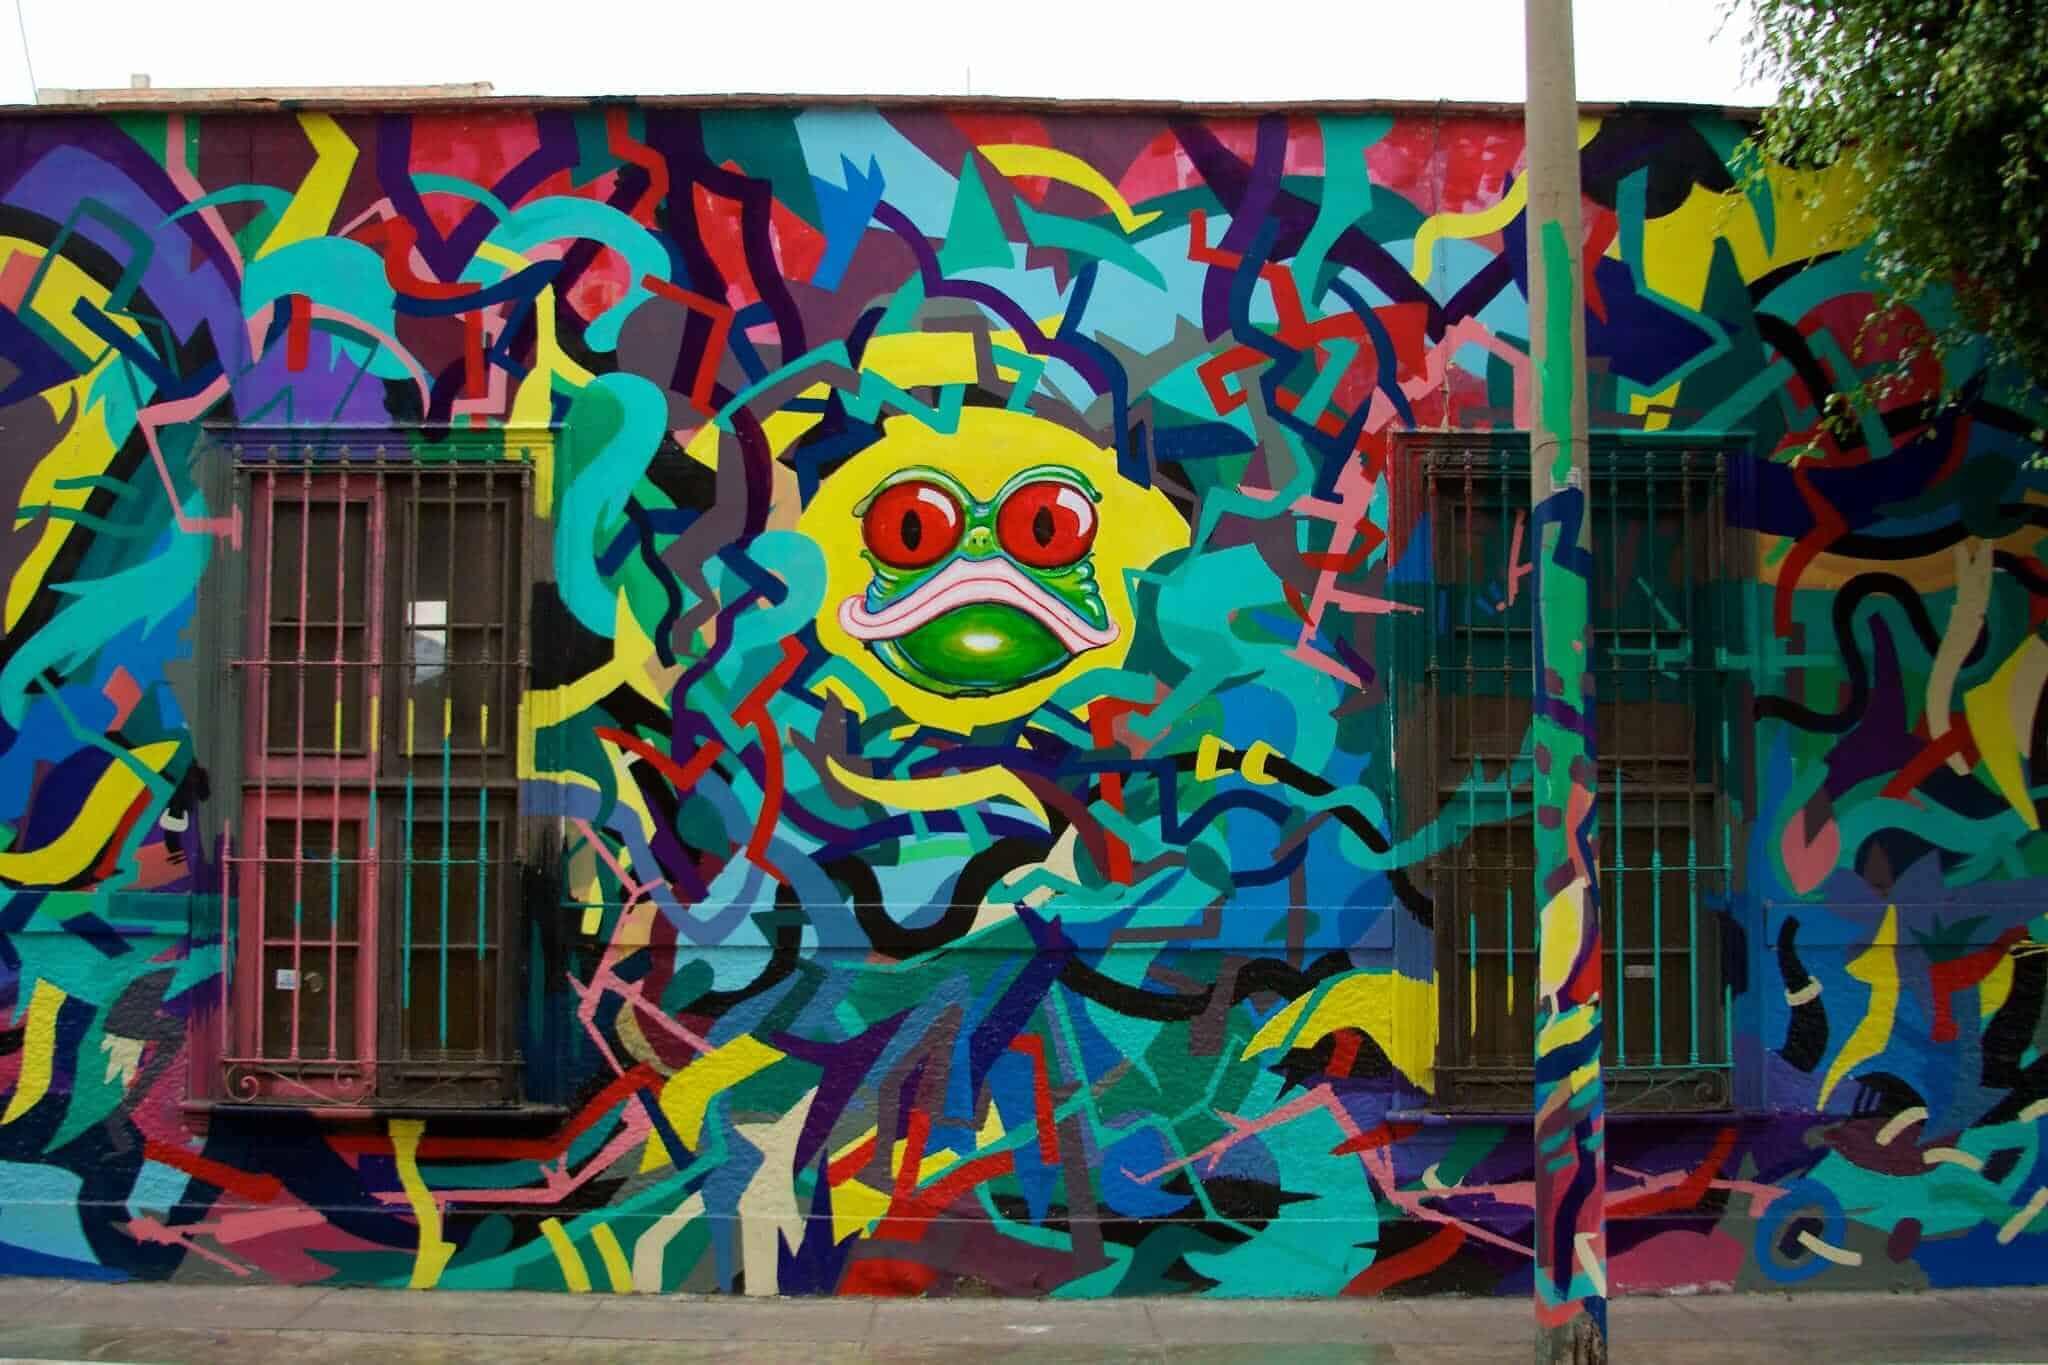 Barranco street art, Lima, Peru